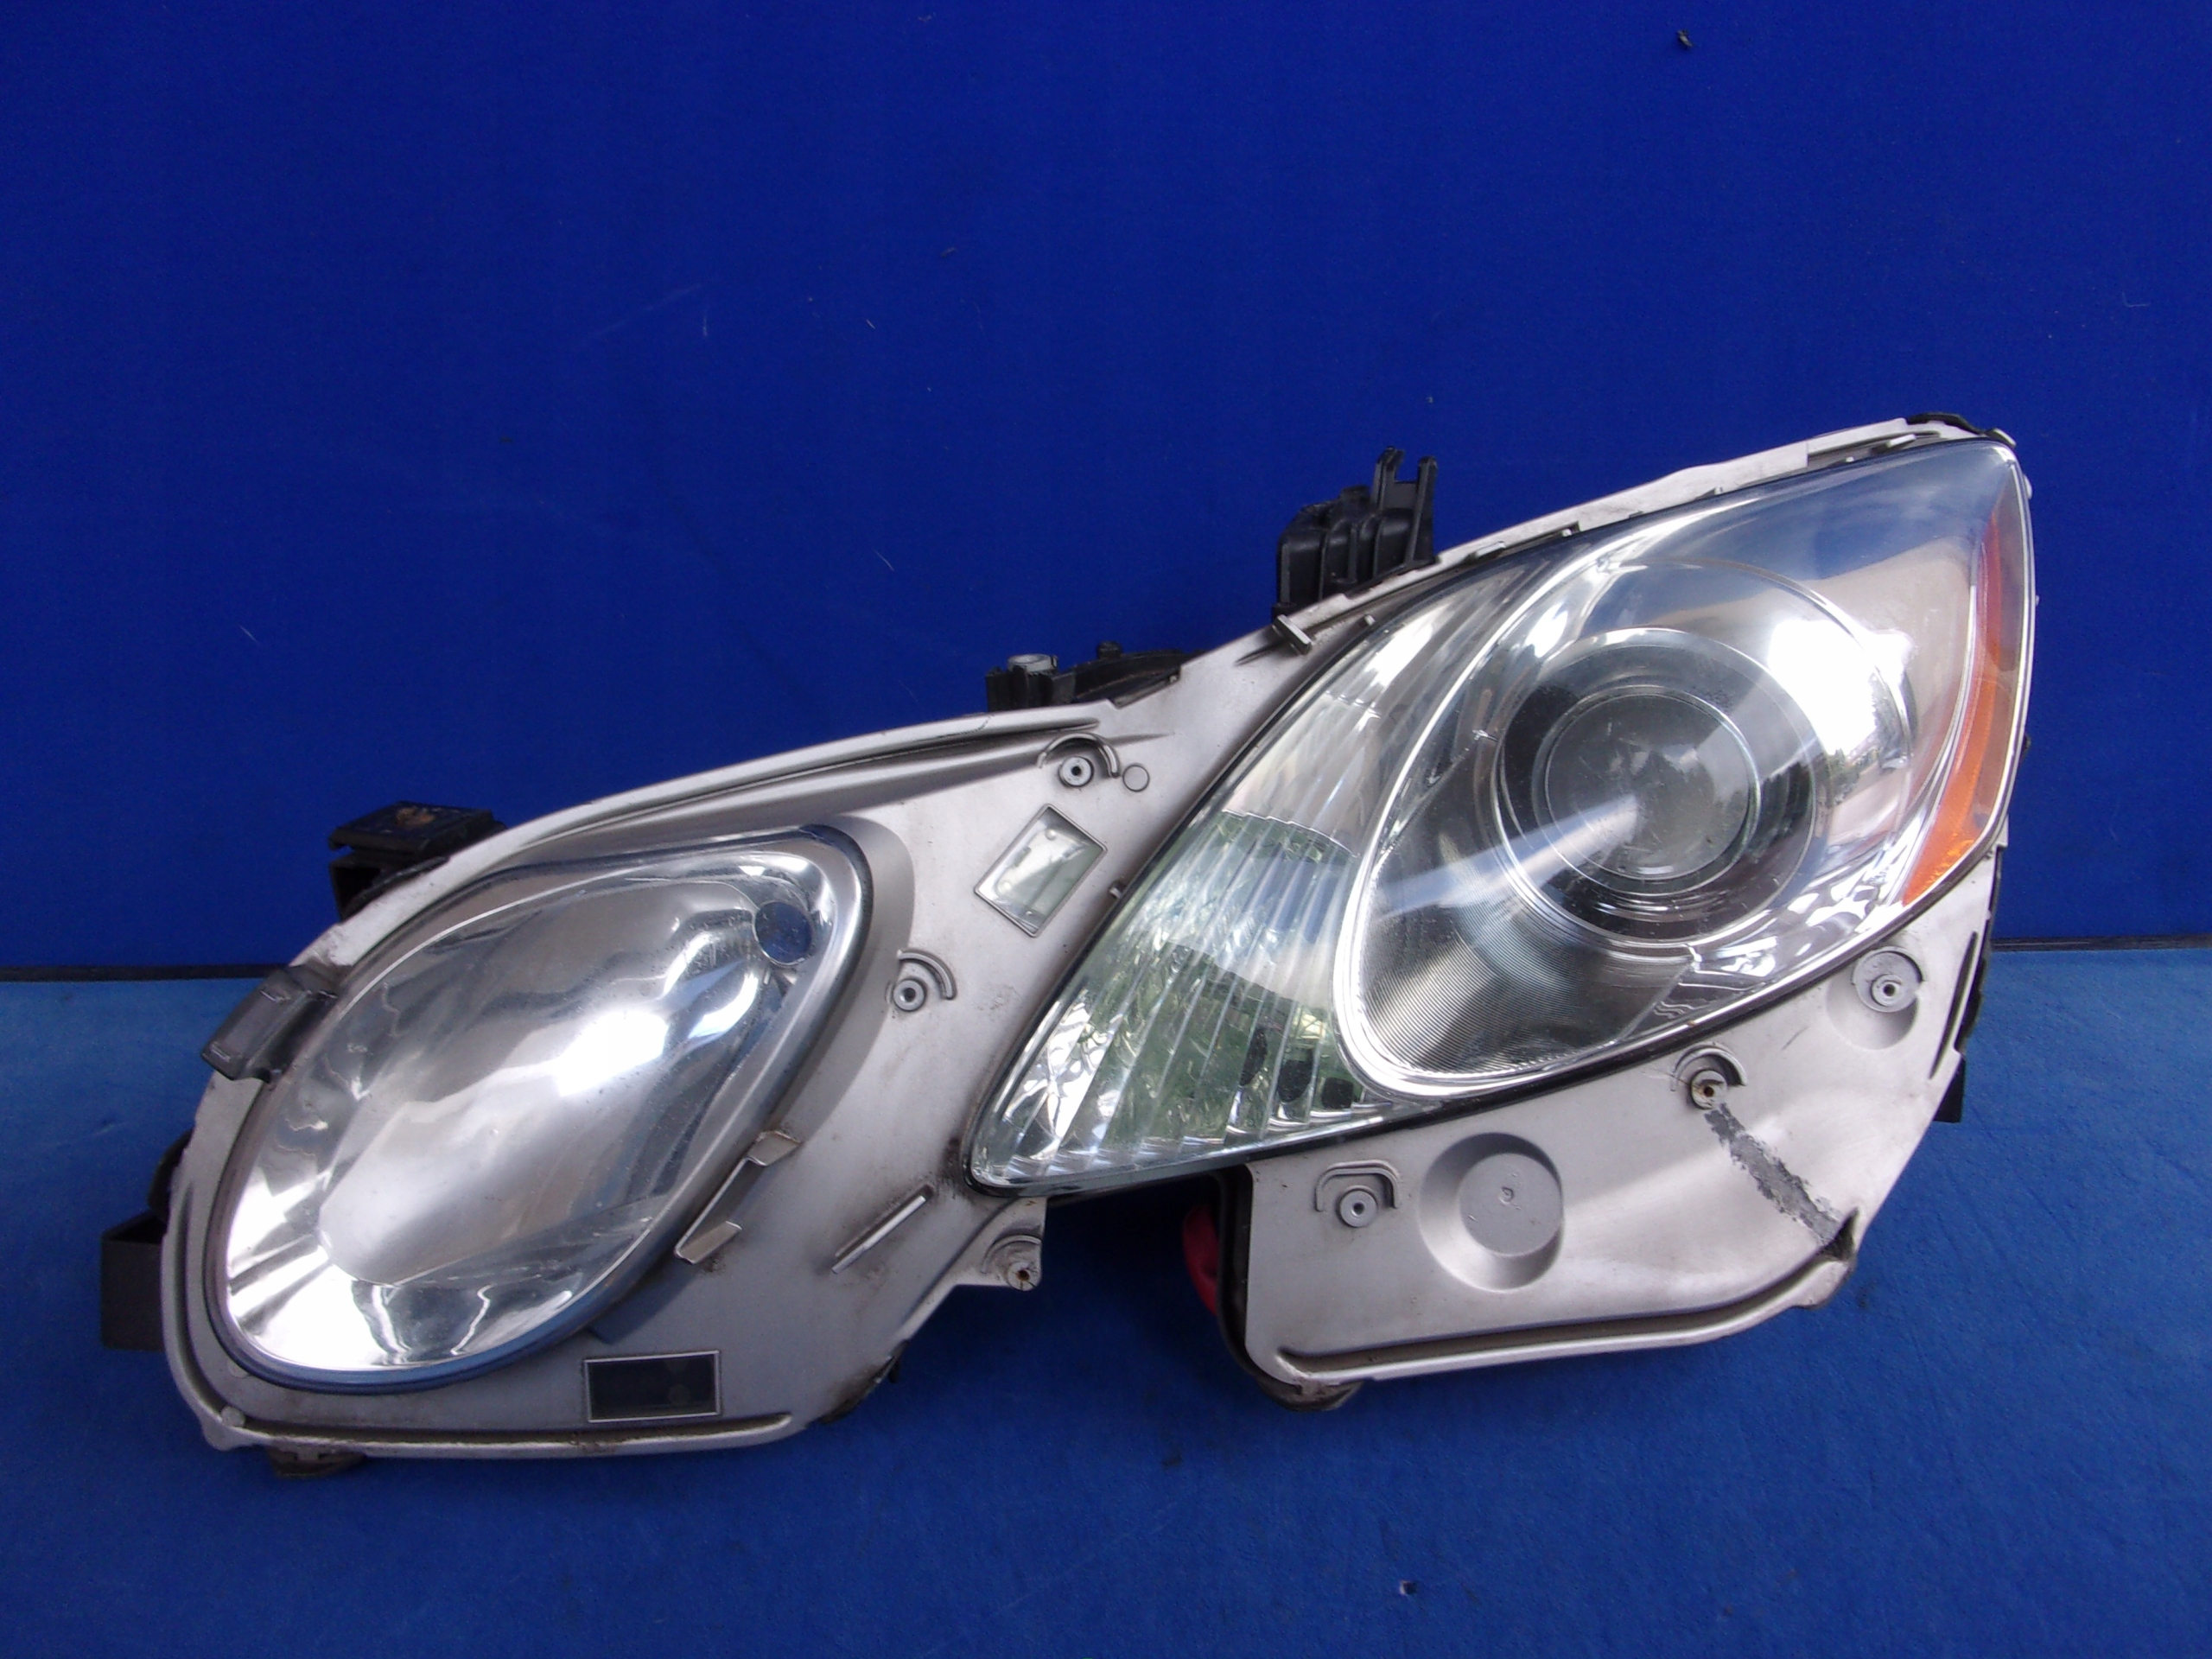 lexus gs300 450 2005-2011 05 ксенон фары лампа